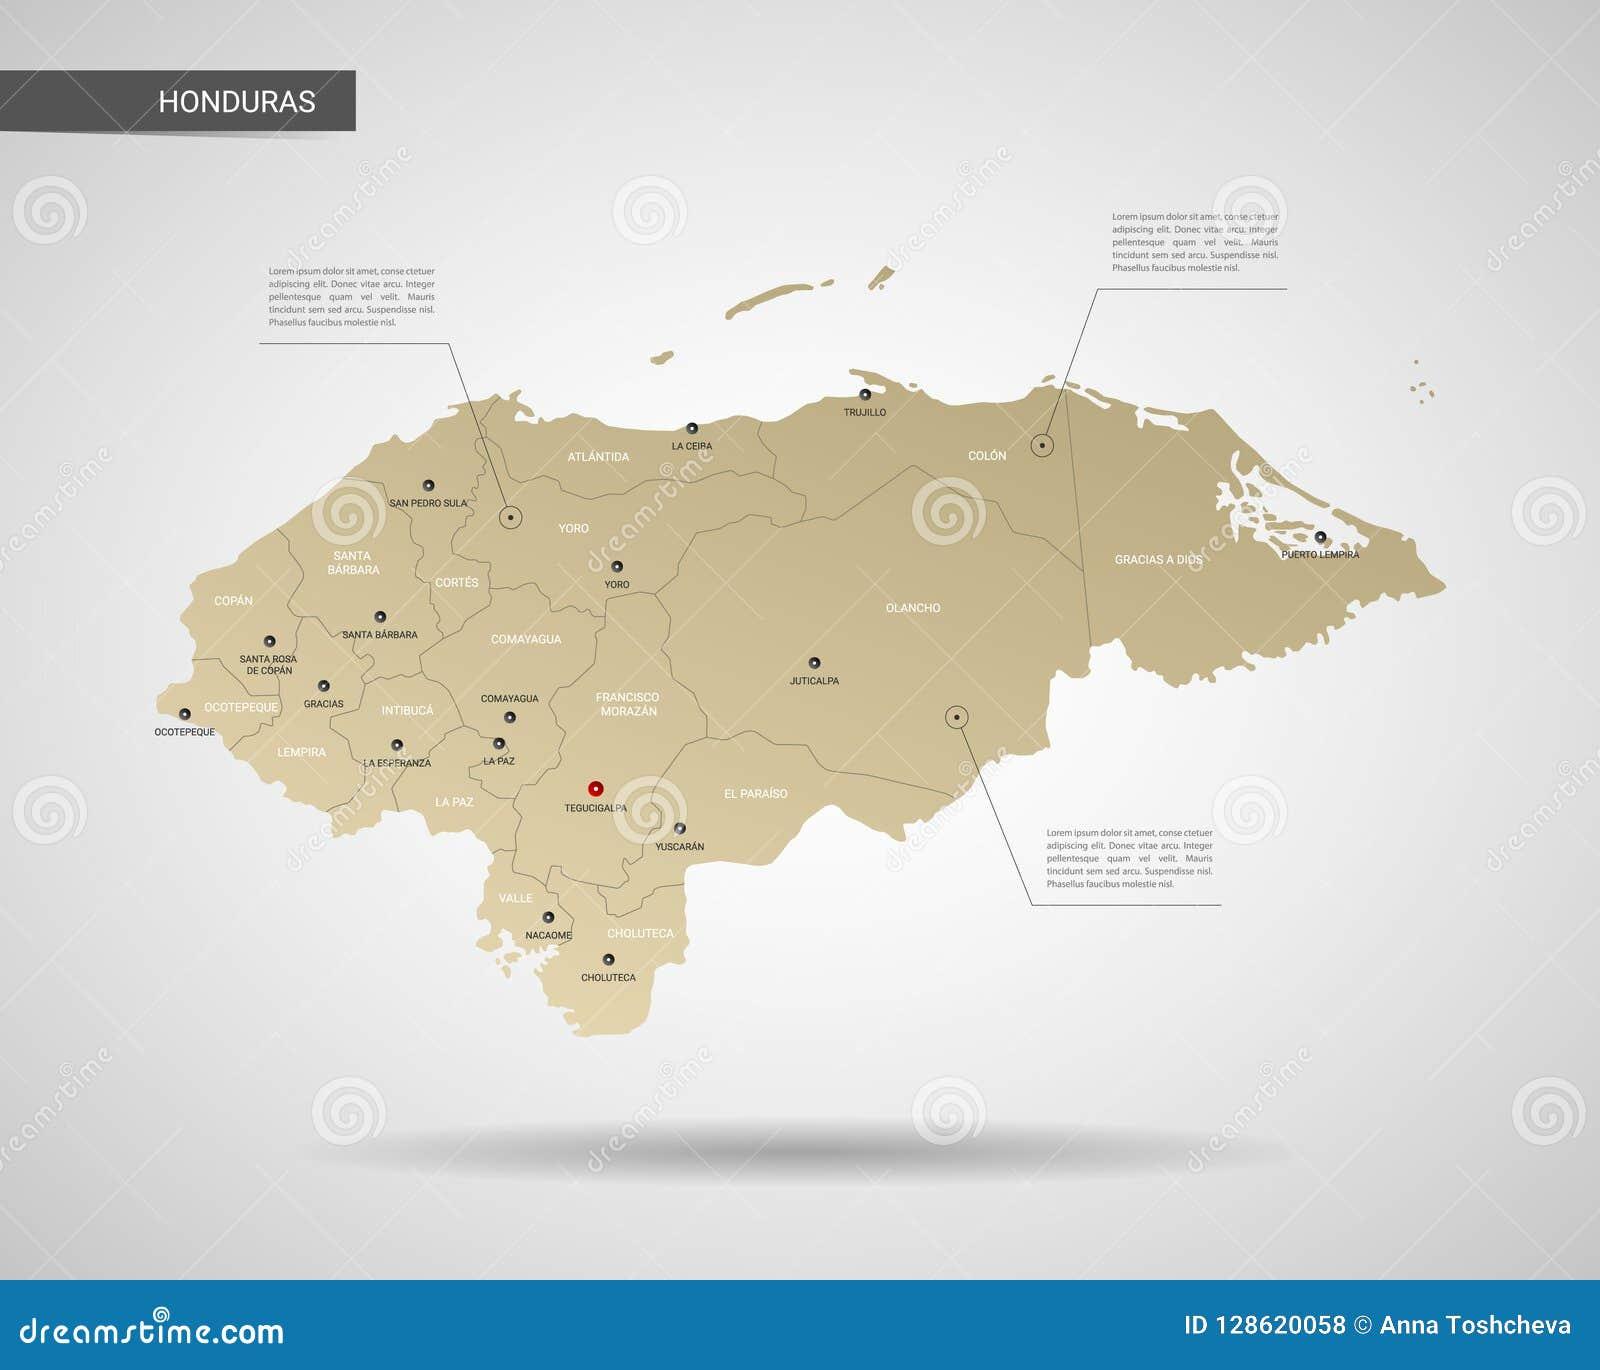 Ilustracao Estilizado Do Vetor Do Mapa Das Honduras Ilustracao Do